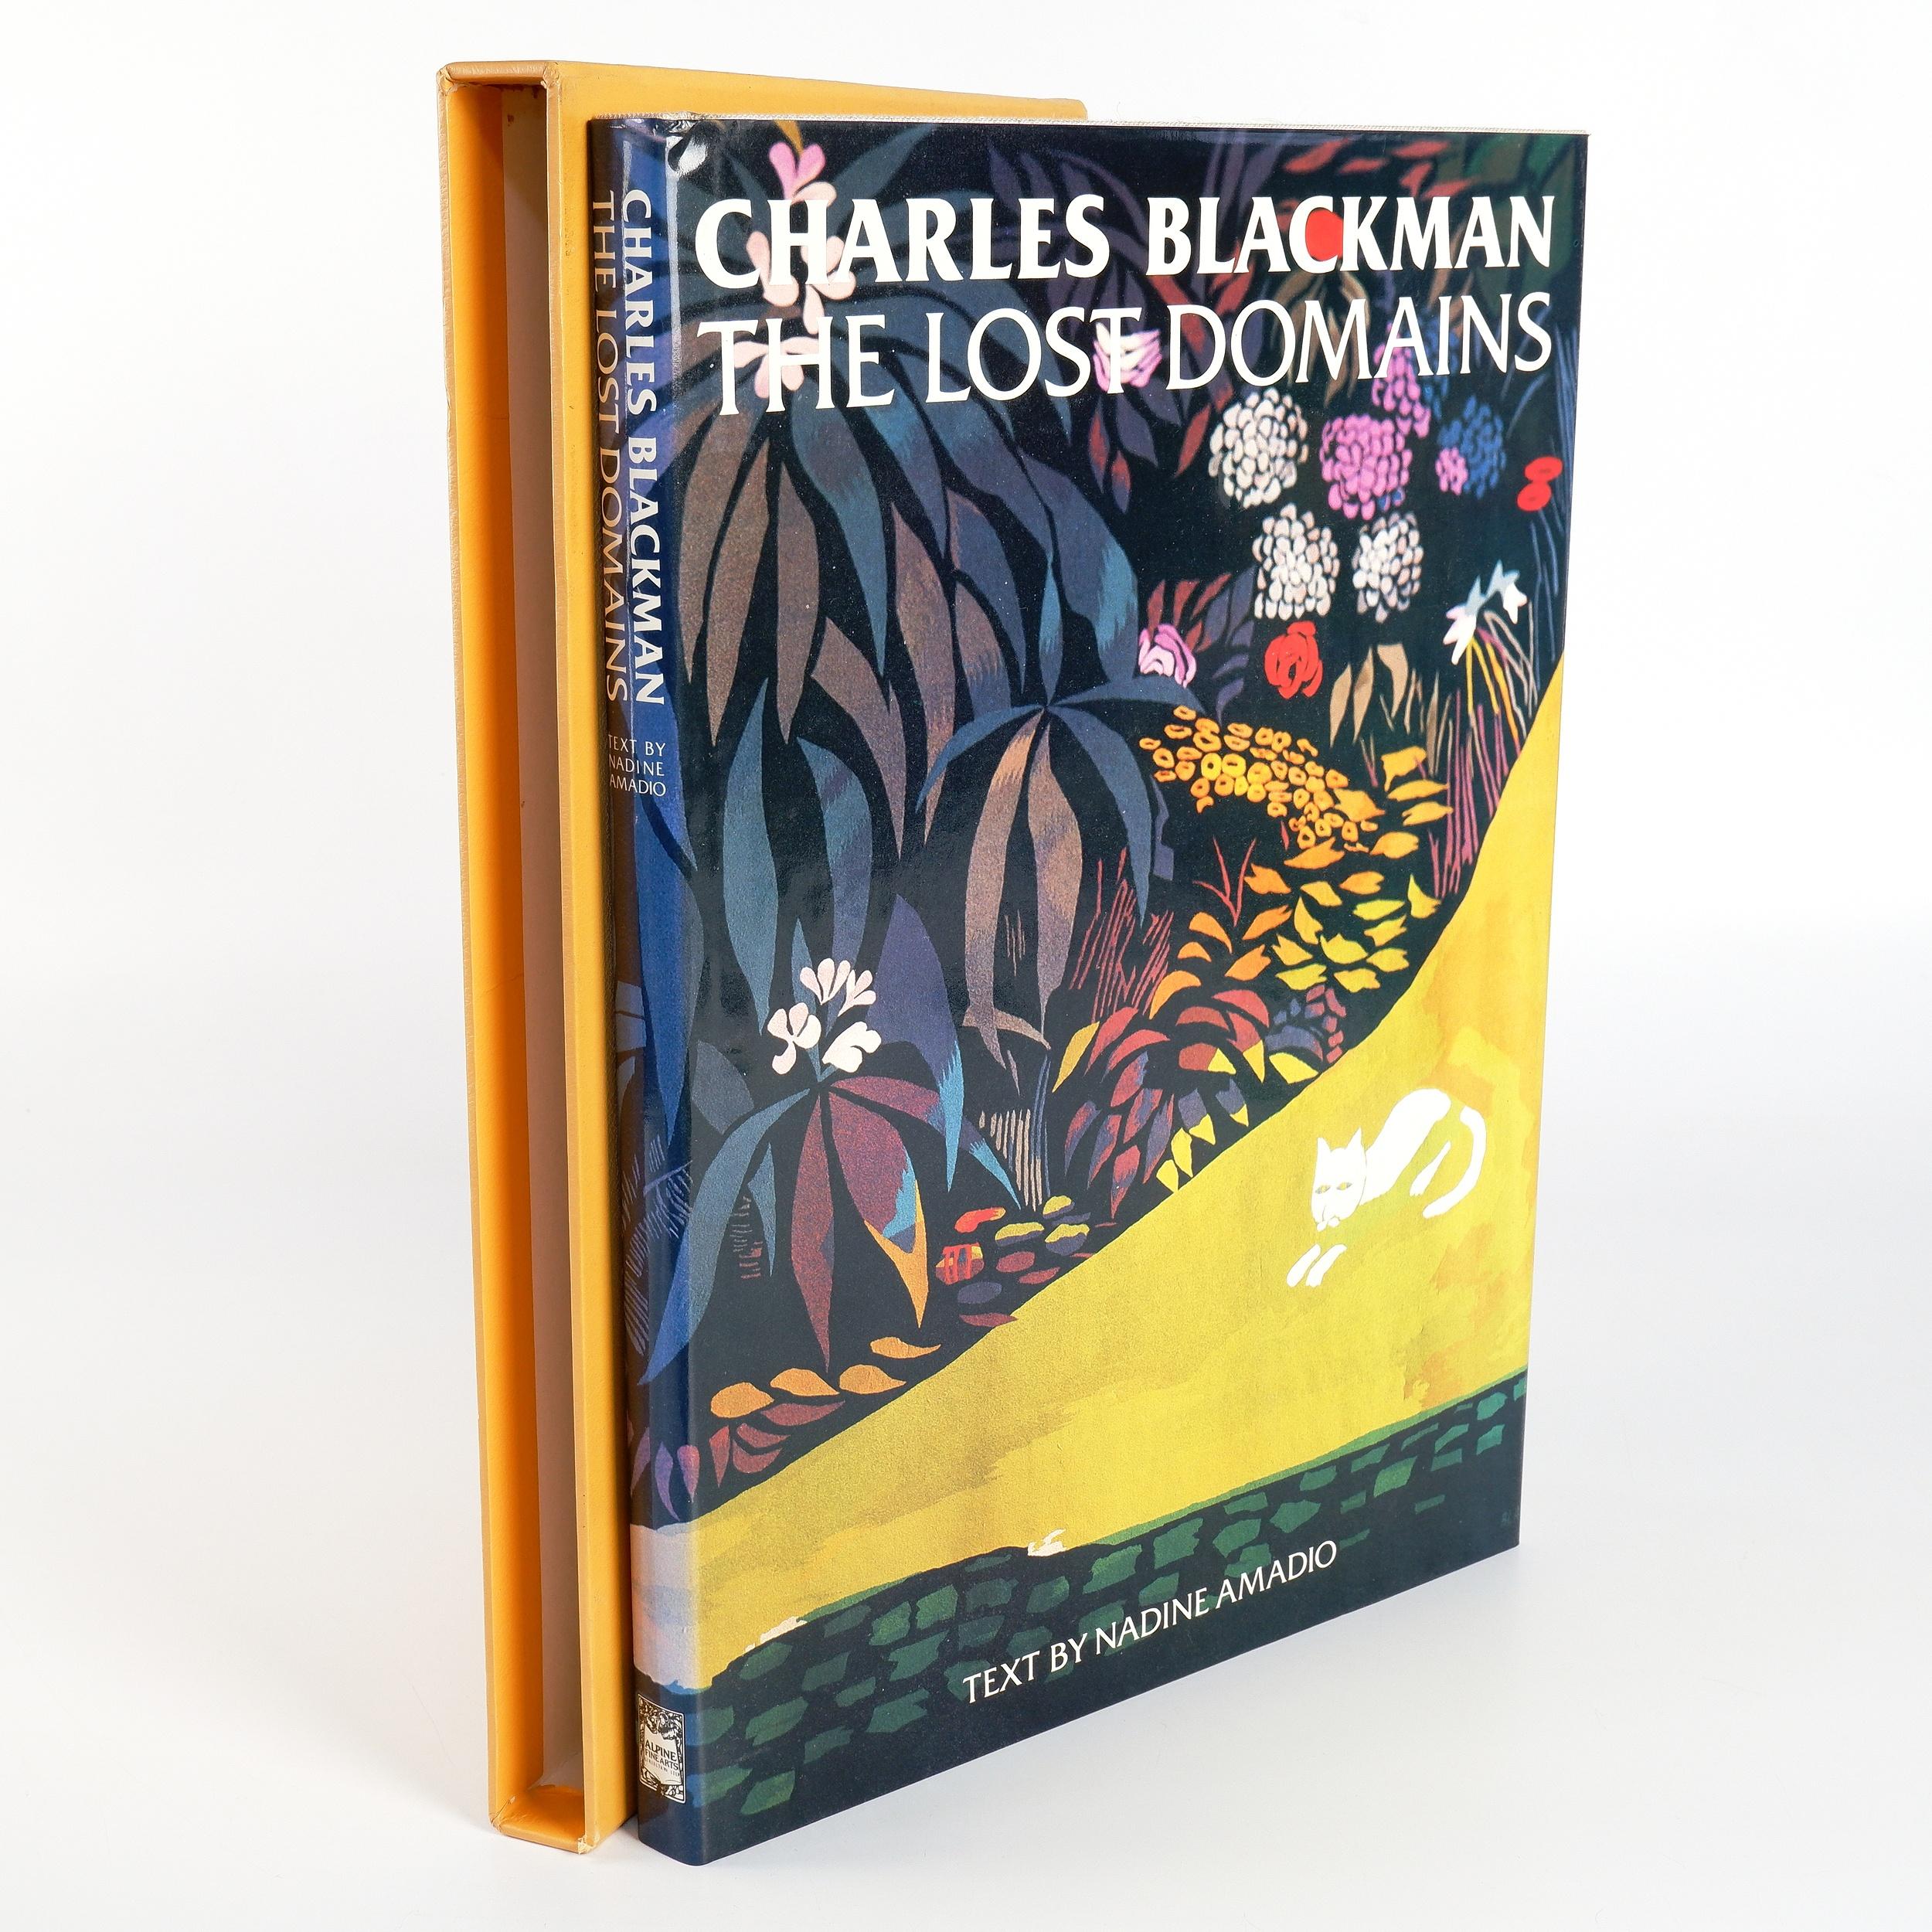 'Amadio, Nadine, Charles Blackman, The Lost Domains, Alpine Fine Arts 1982.'